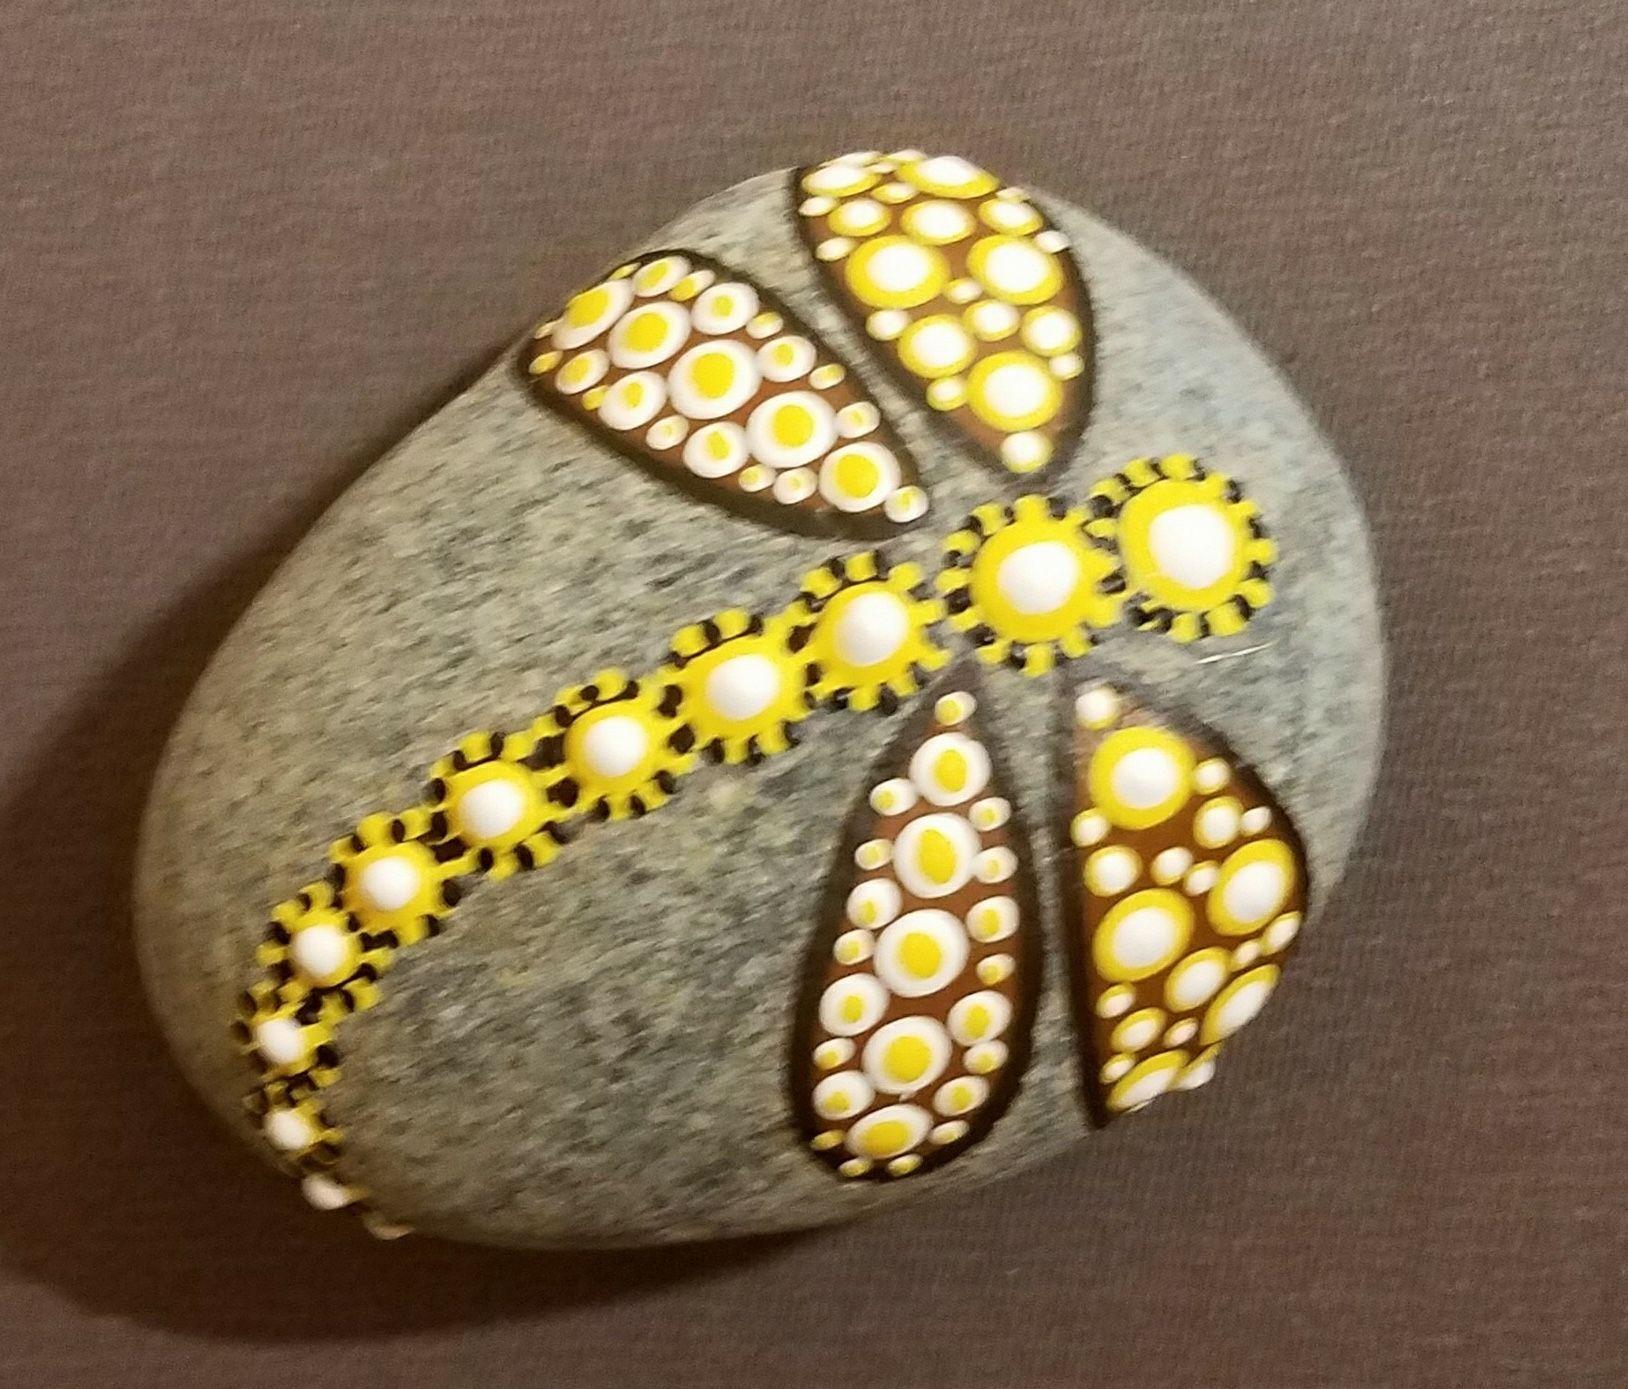 Rock Painting Rock Painting Designs Painted Rocks Rock Painting Art